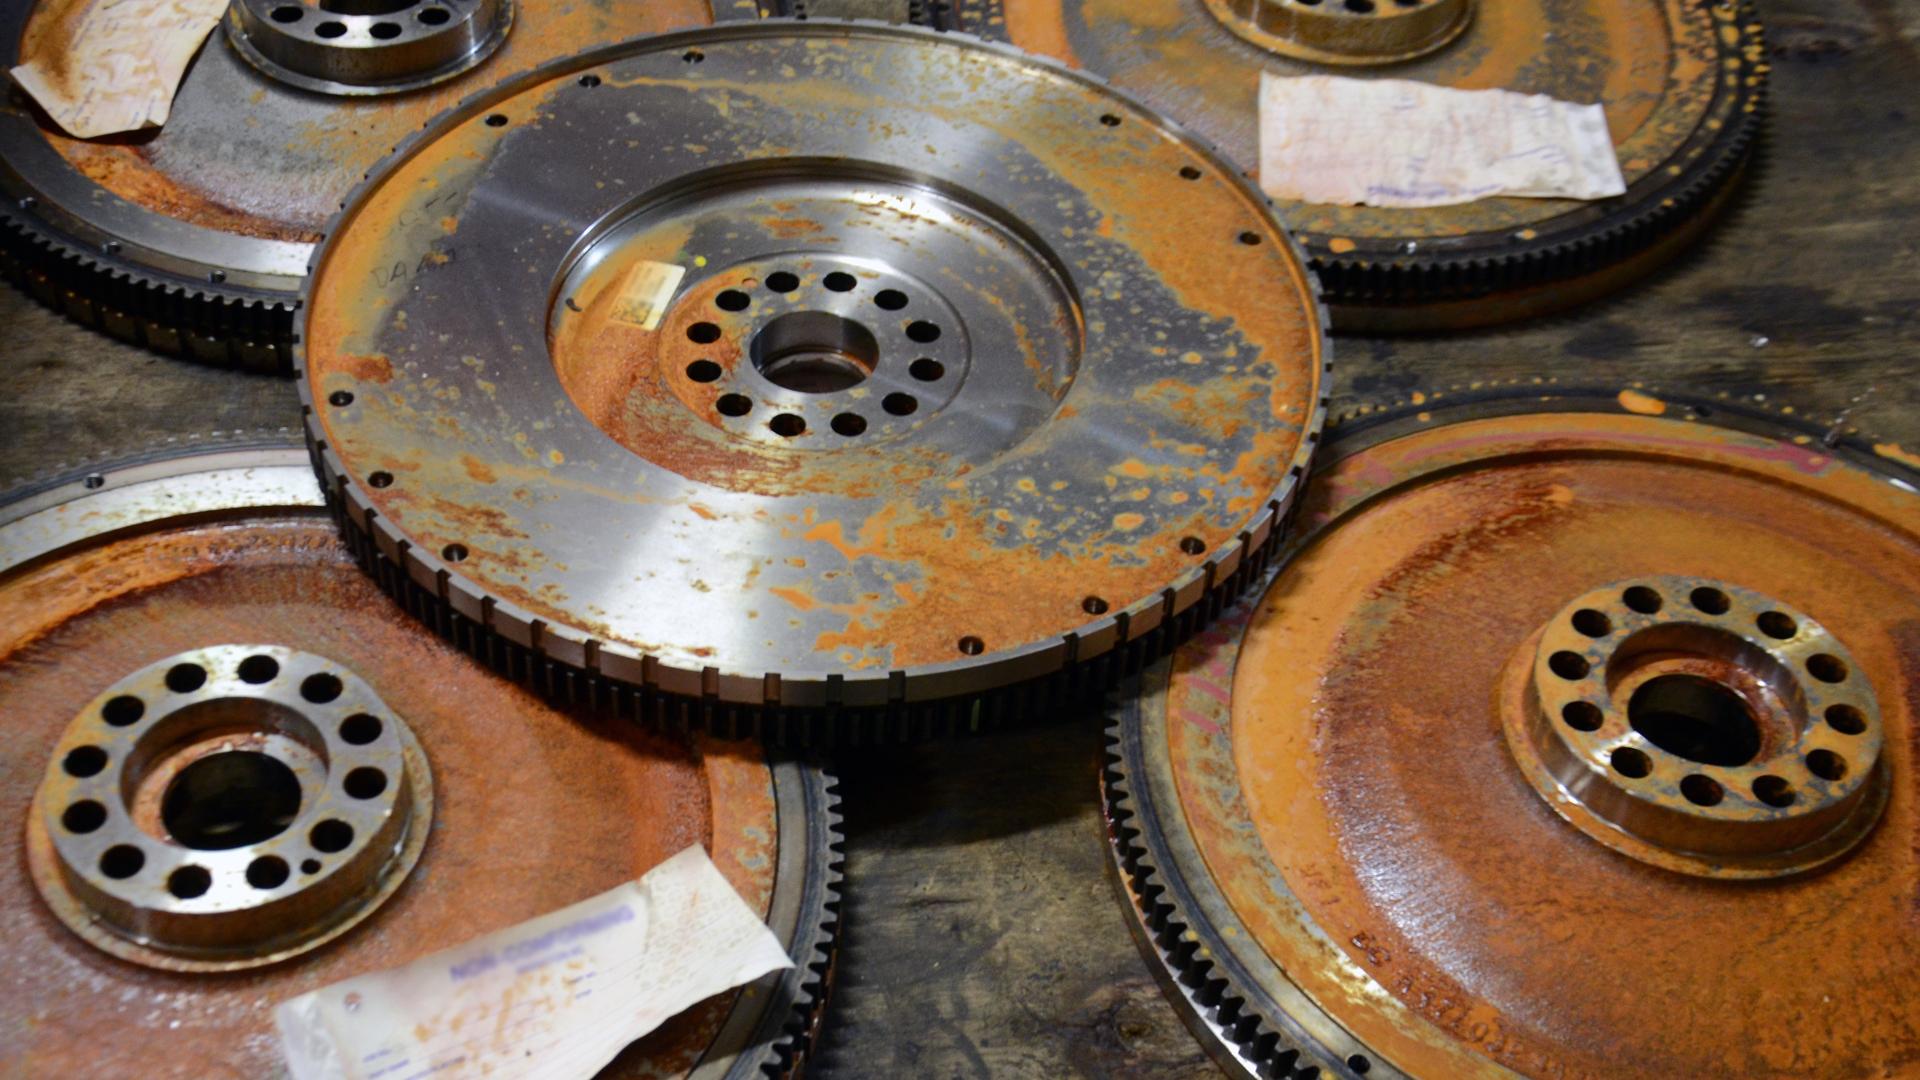 ARMOR Gear Rust Removal